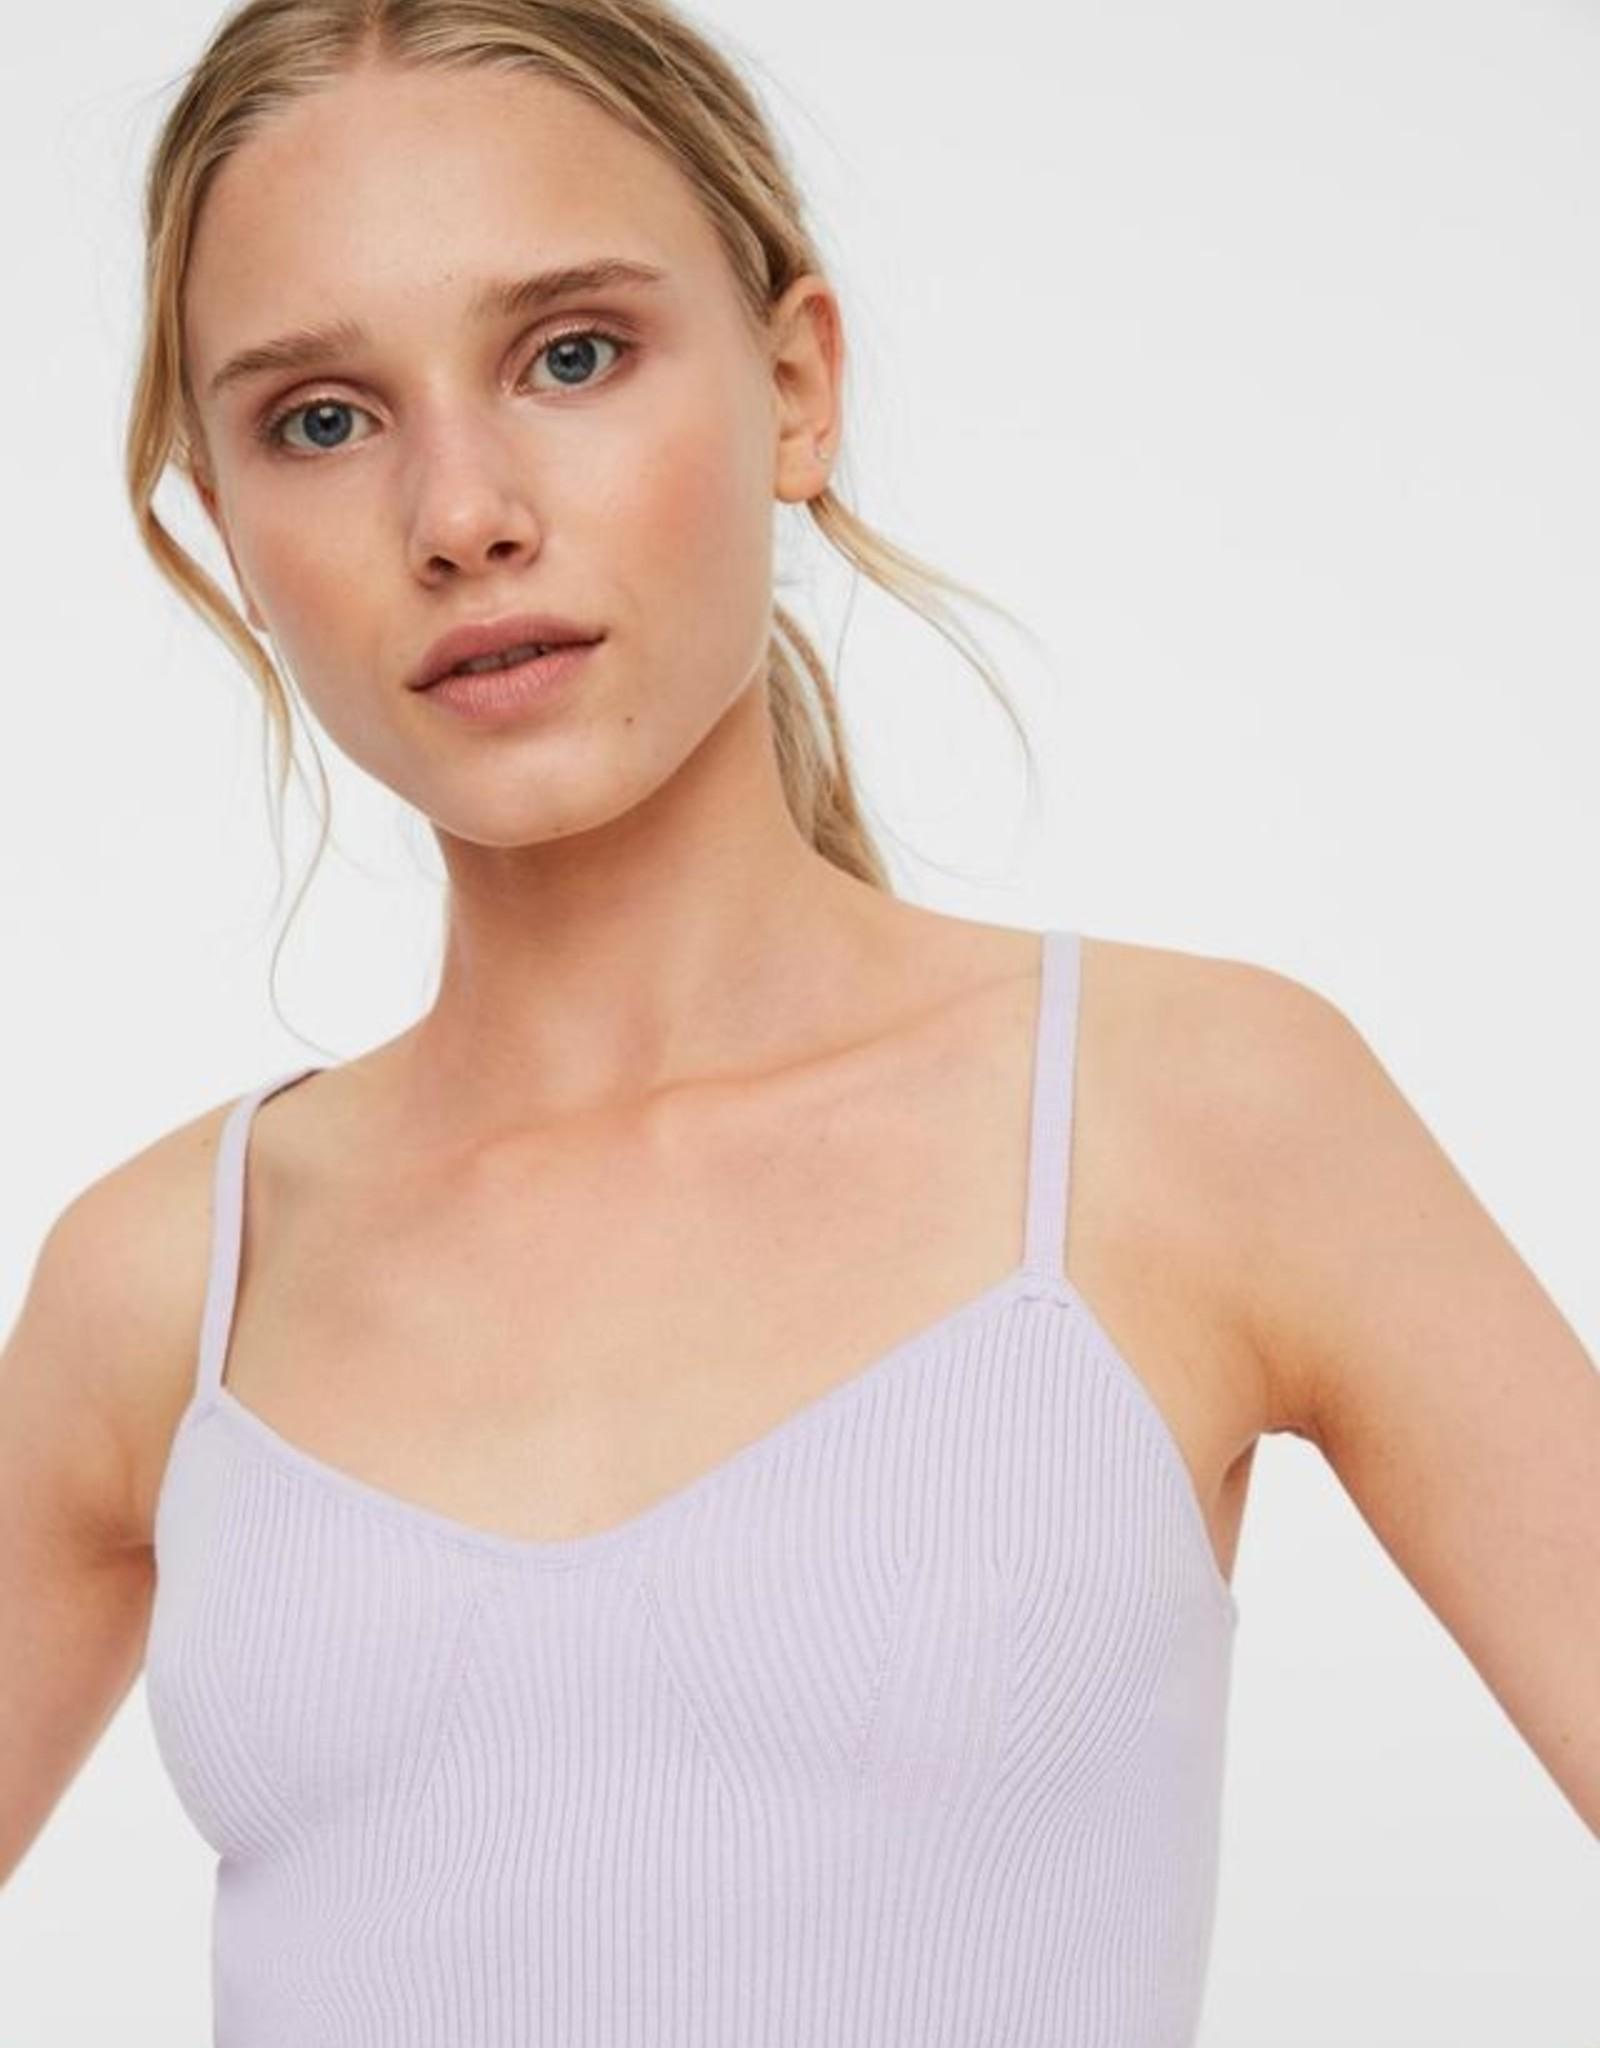 Vero Moda Lonnie Ribbed Knit BodySuit